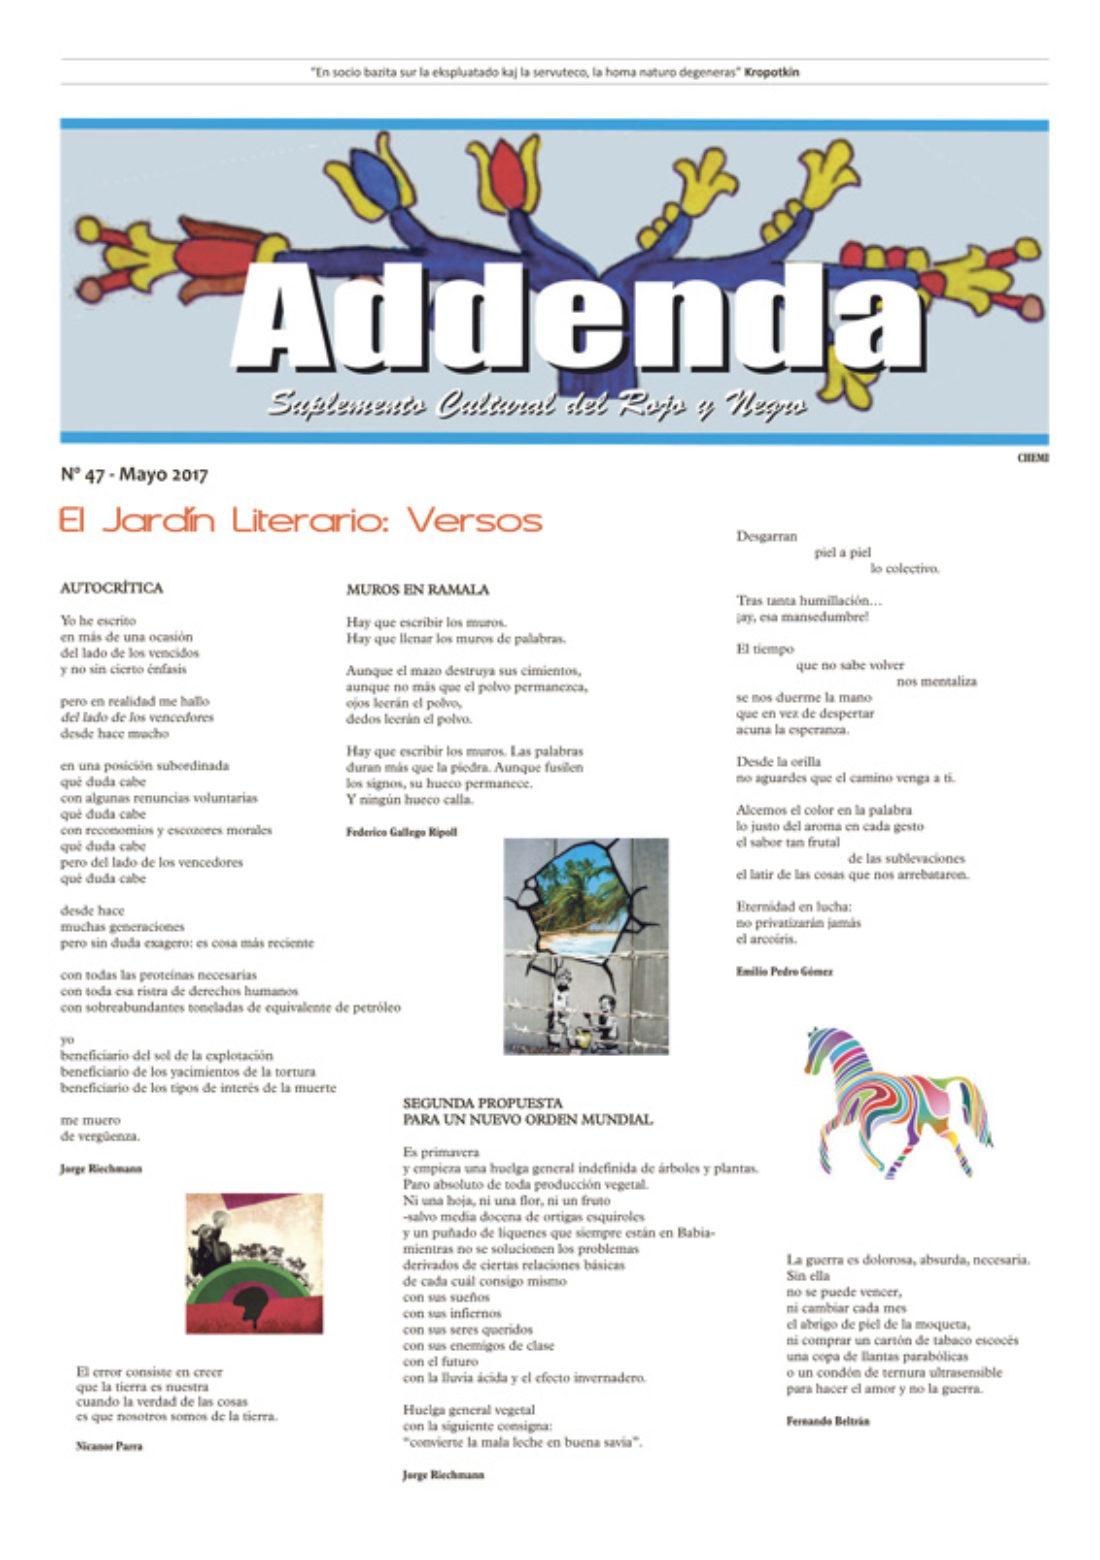 Addenda, suplemento cultural del RyN – Nº 47, mayo 2017